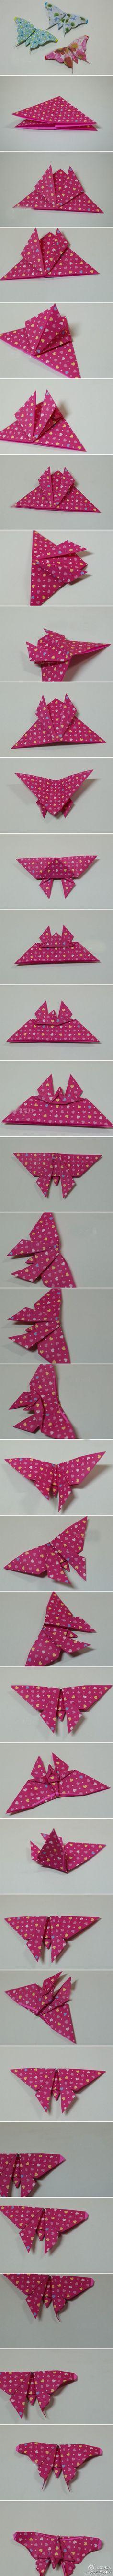 Origami de borboleta.